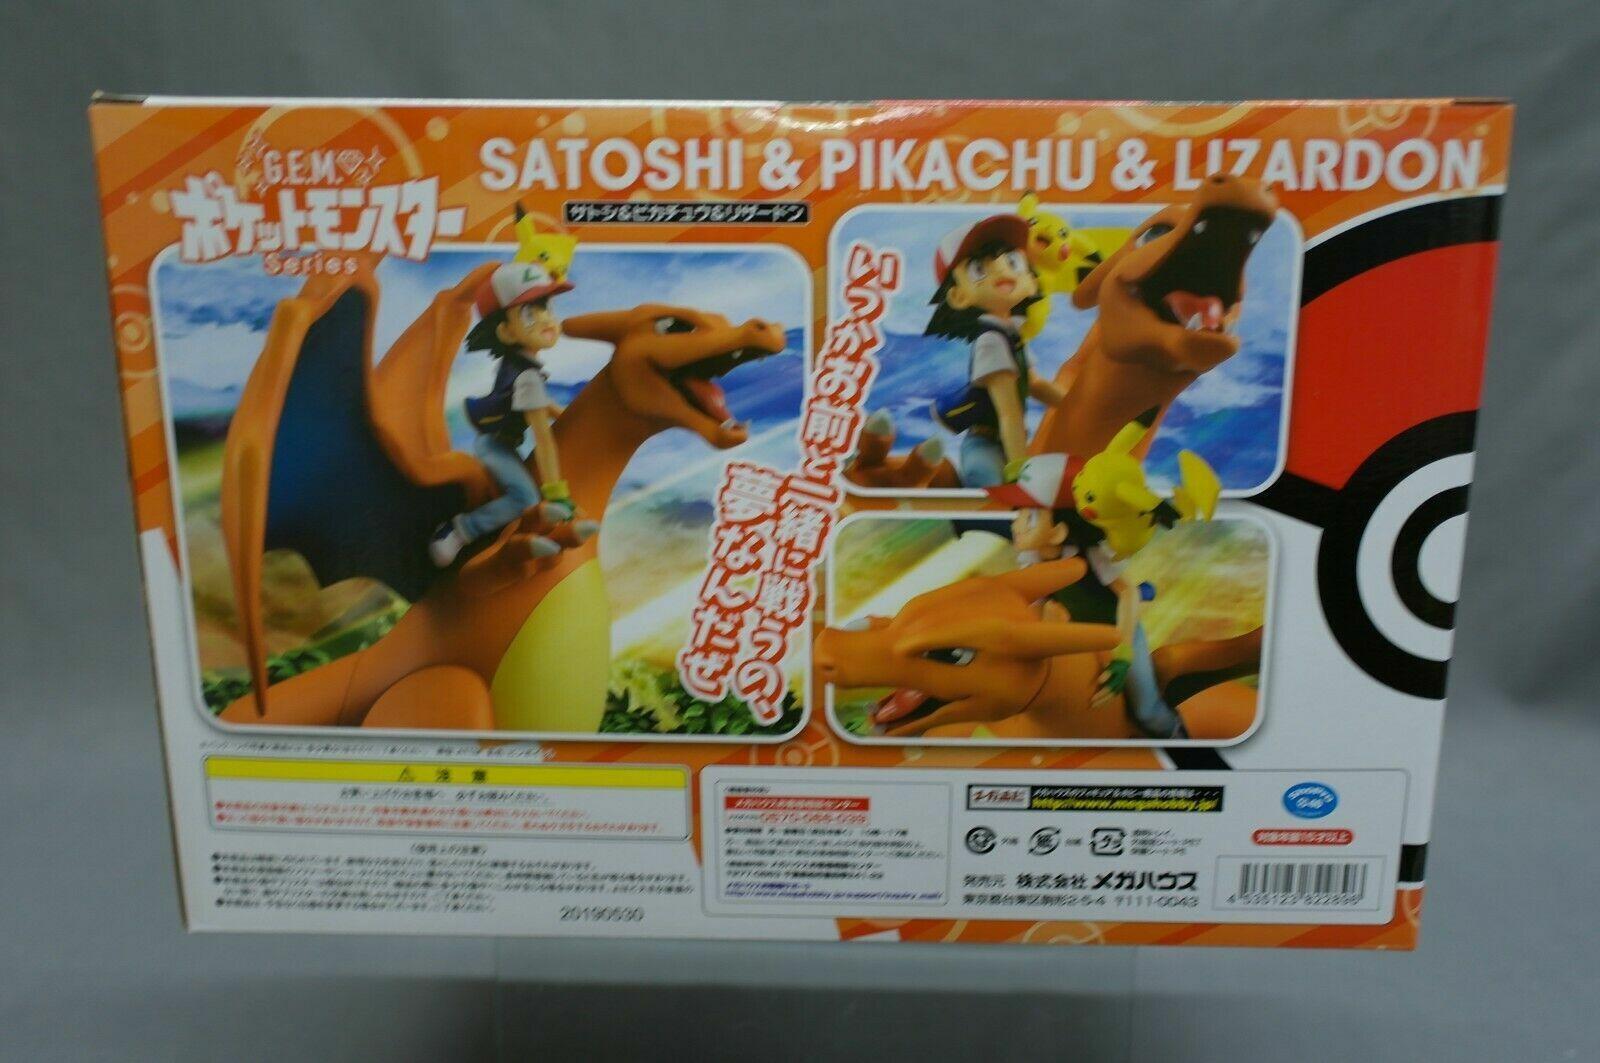 GEM G.E.M. Series Series Series Pokemon Ash Ketchum Pikachu & Charizard MegaHouse Japan nuovo 28fdfb